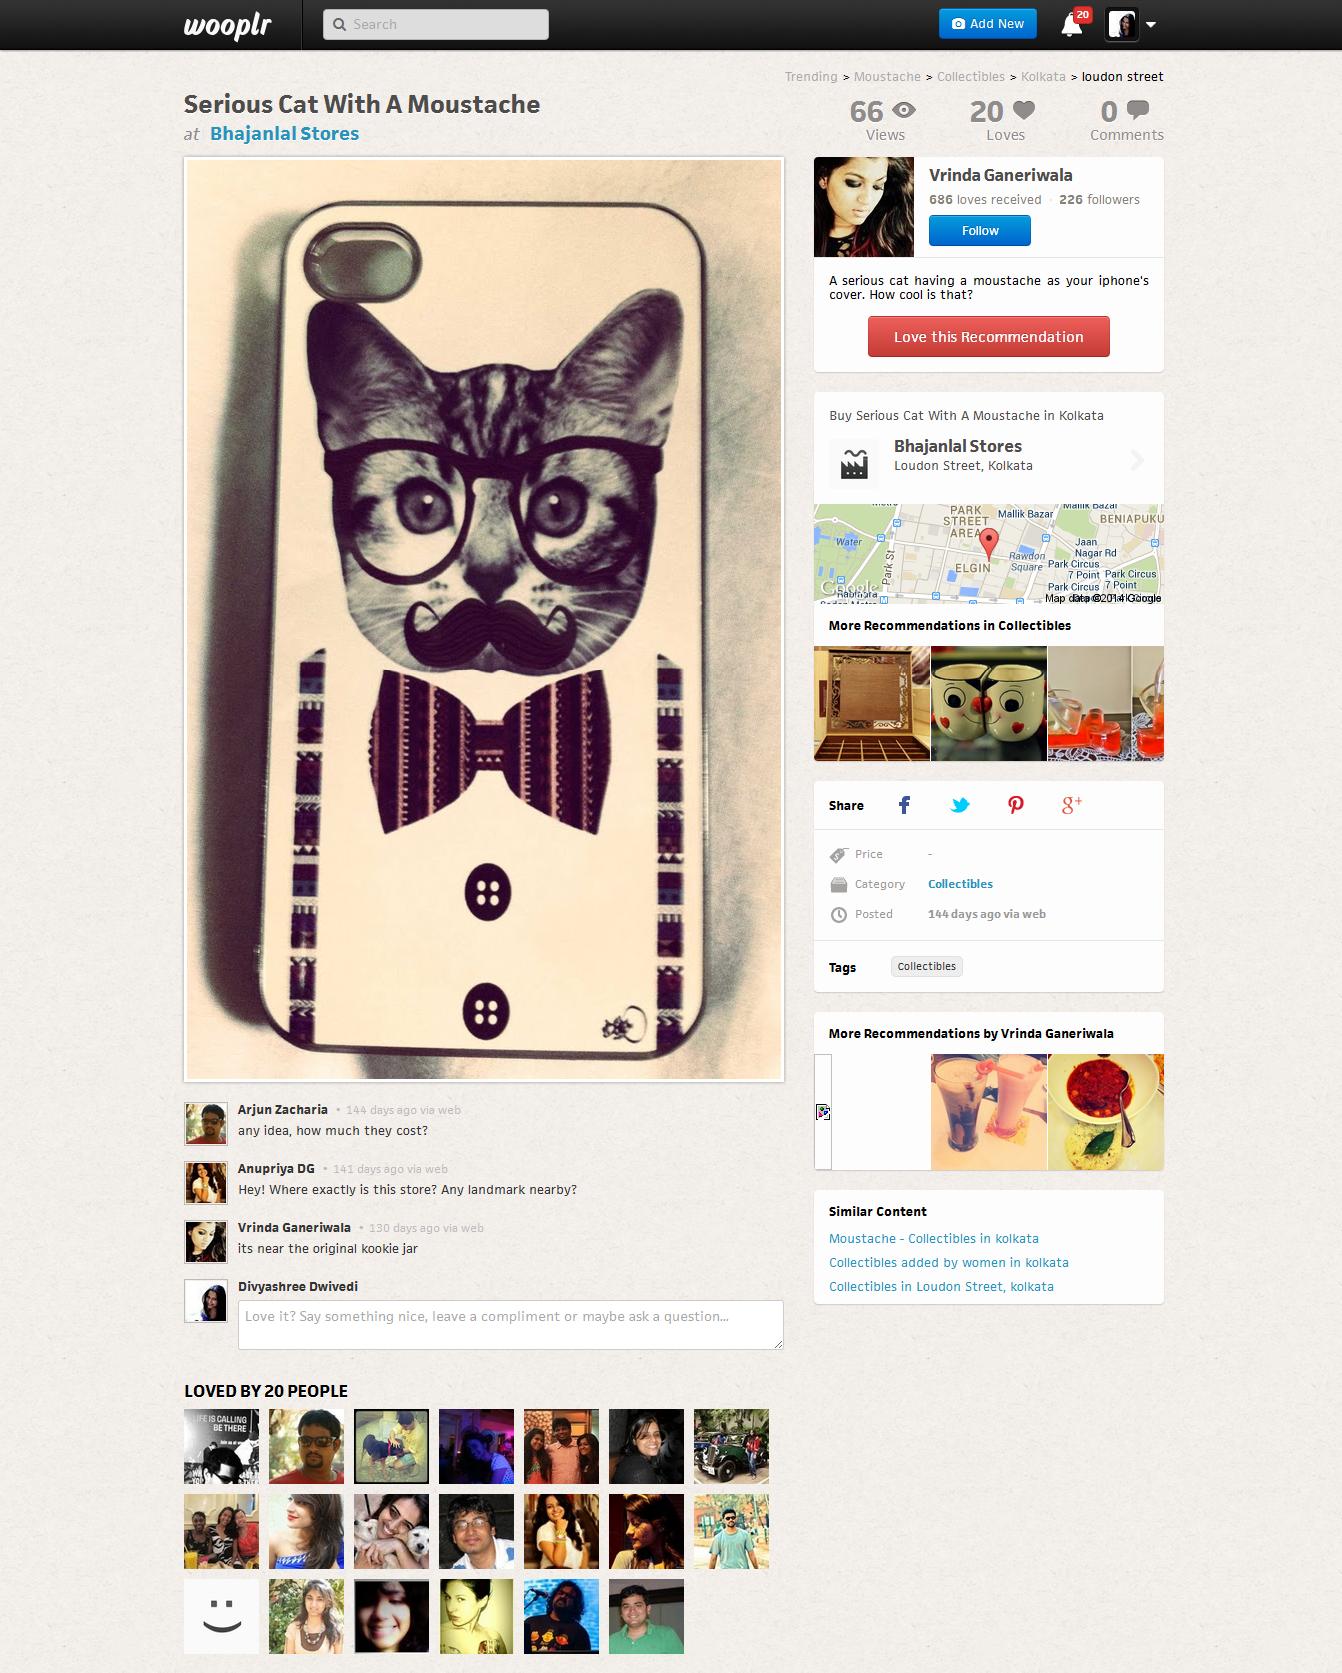 Wooplr social discovery platform